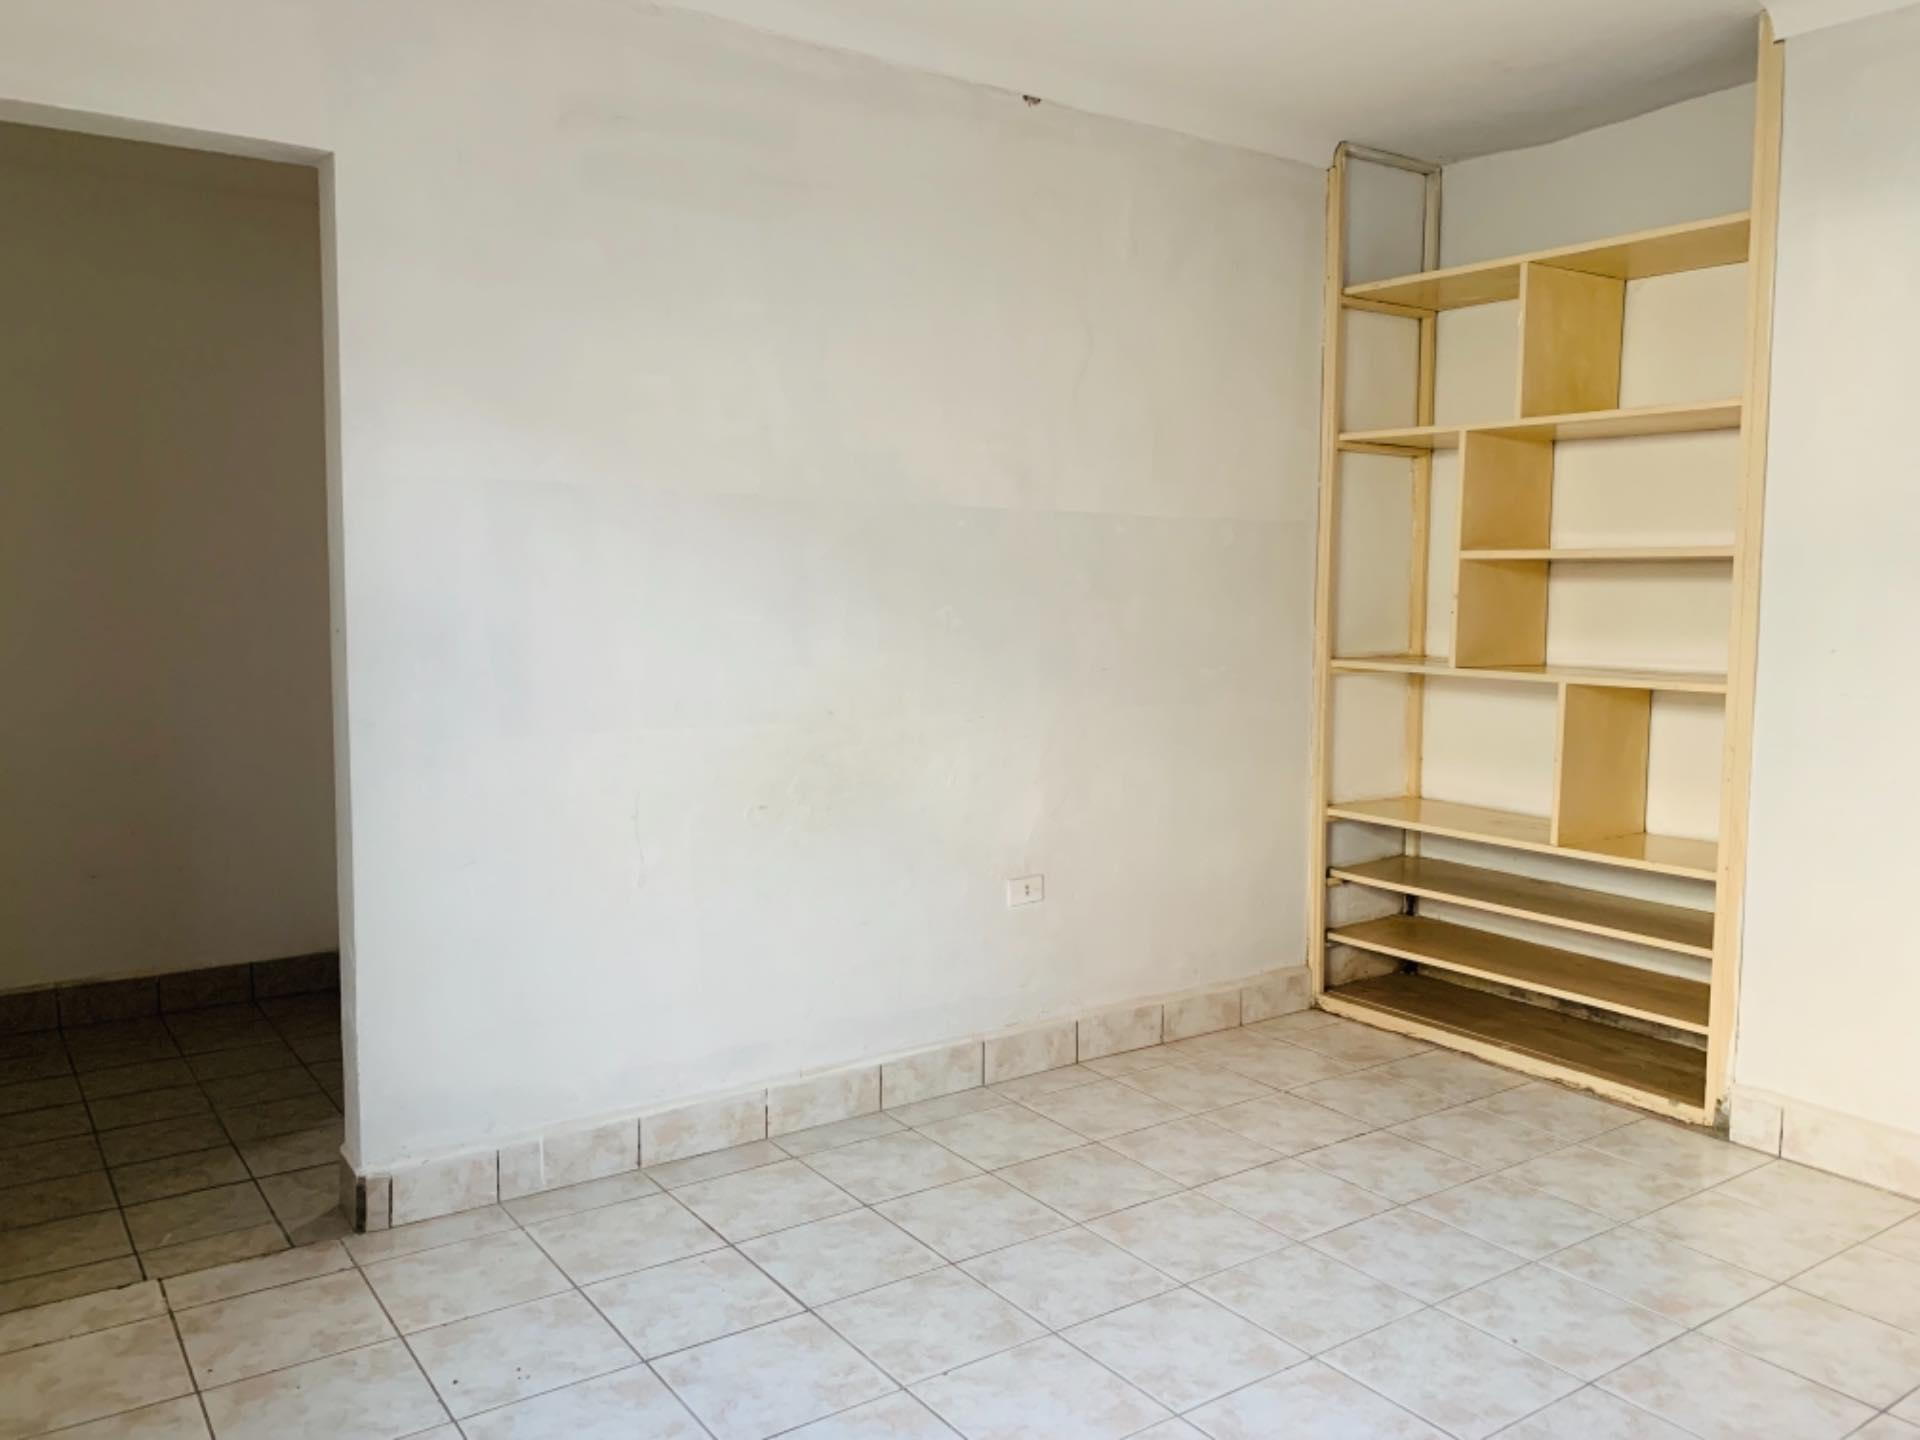 Casa en Alquiler Barrio Equipetrol entre 3er y 4to Anillo Foto 2